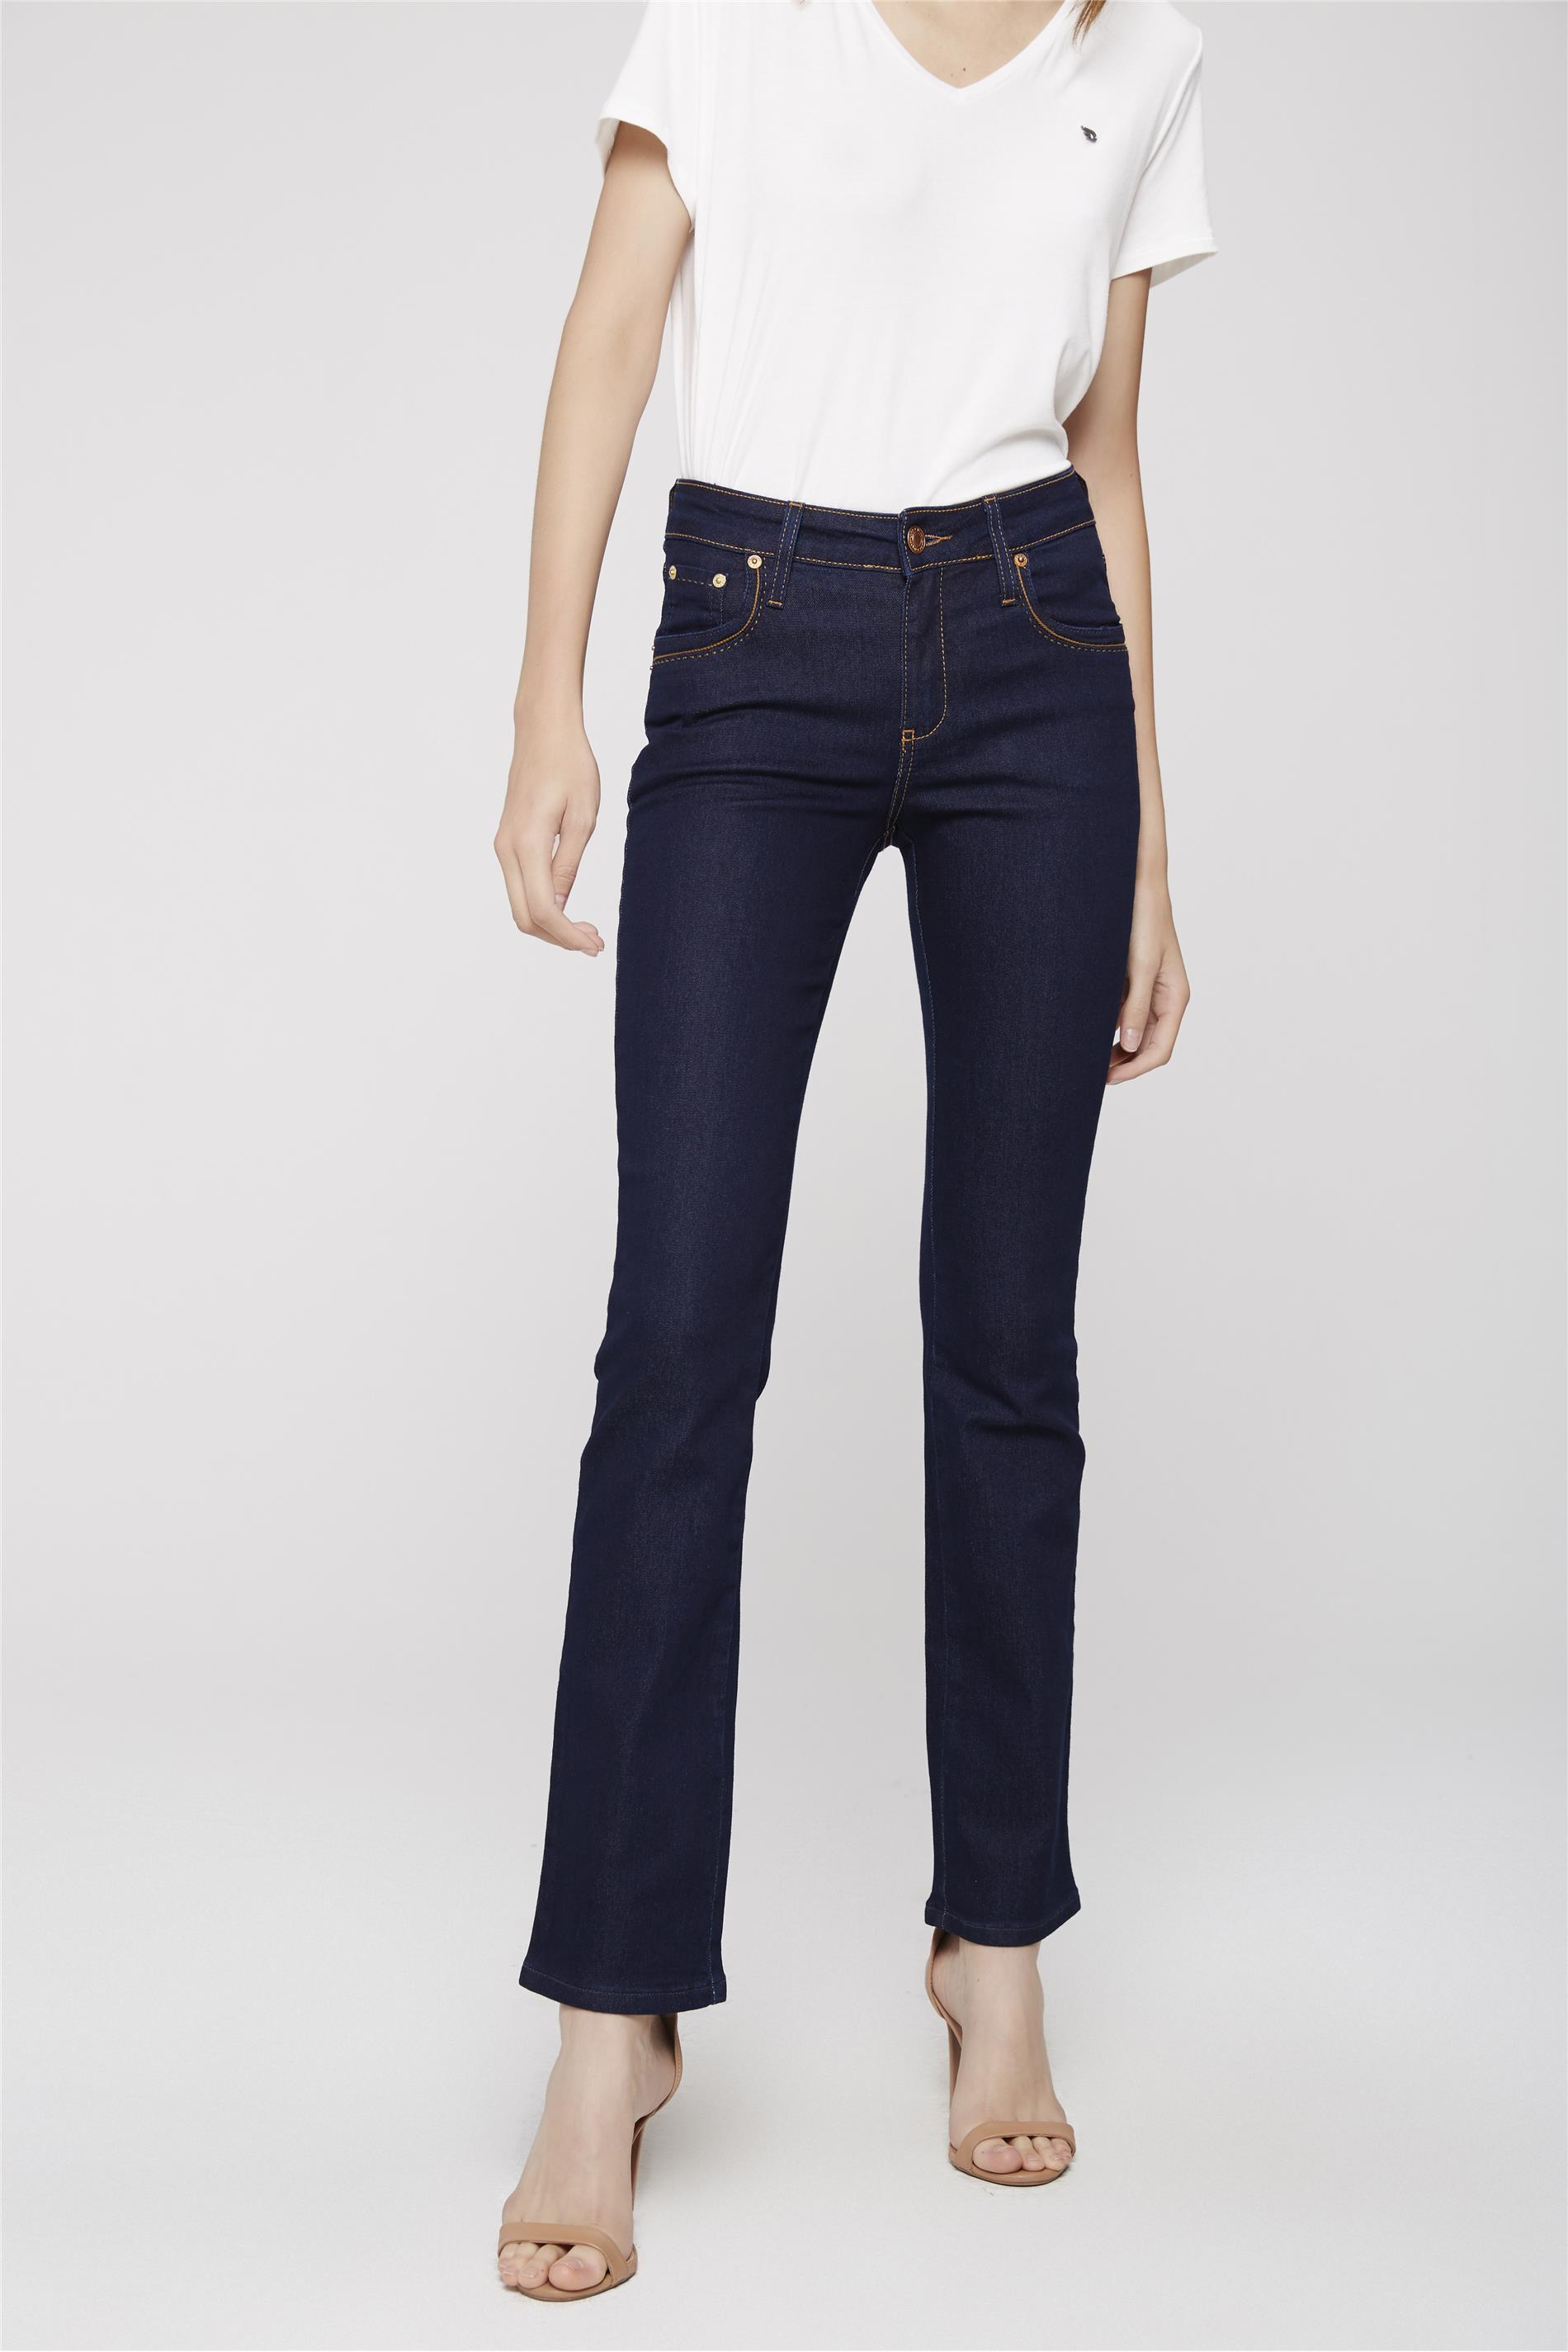 44cec092ec Calça Jeans Reta de Cintura Alta - Damyller